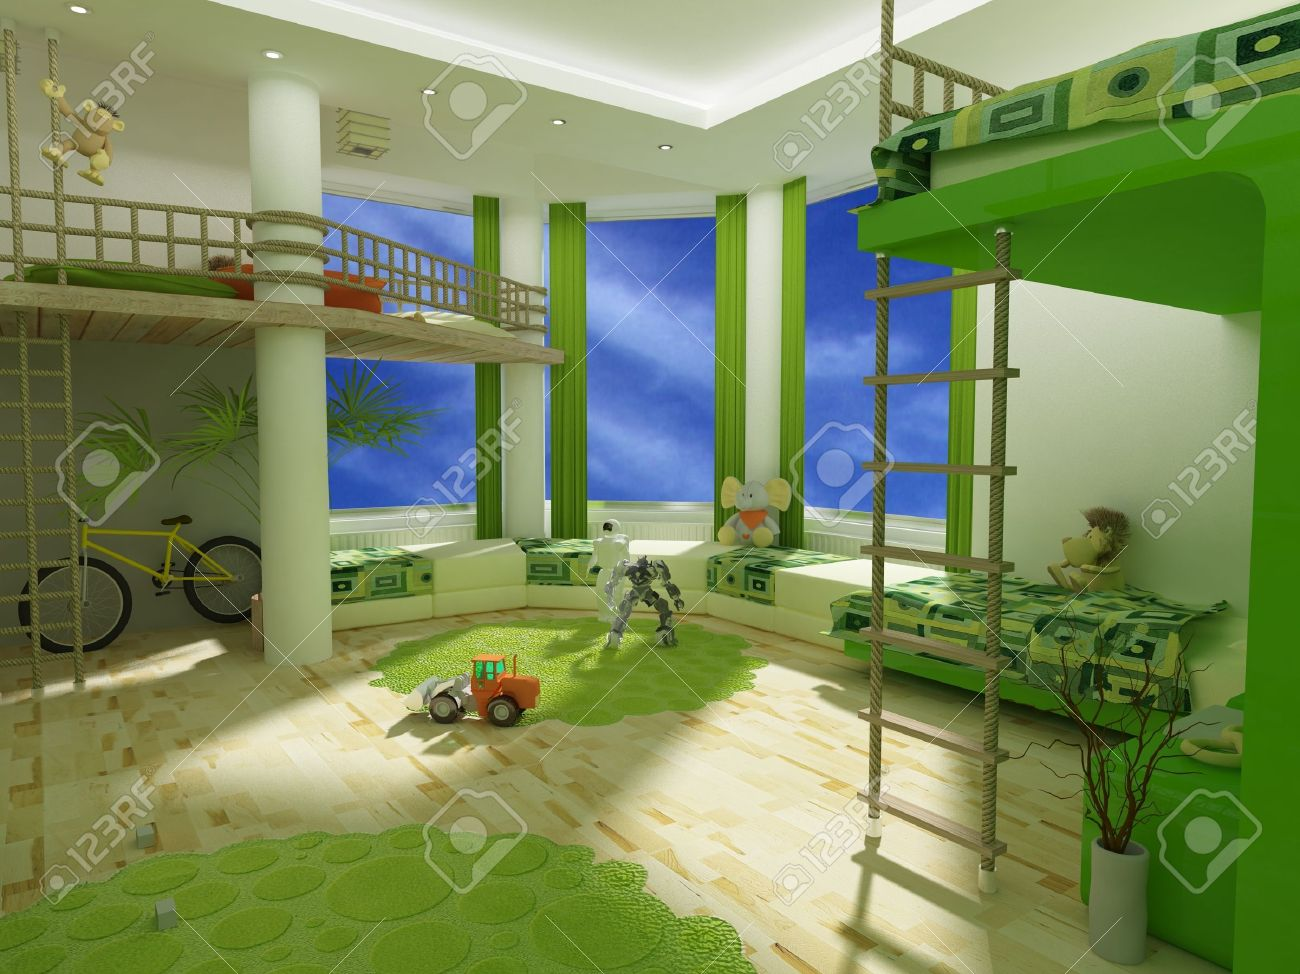 Moderne Kinderzimmer   jamgo.co